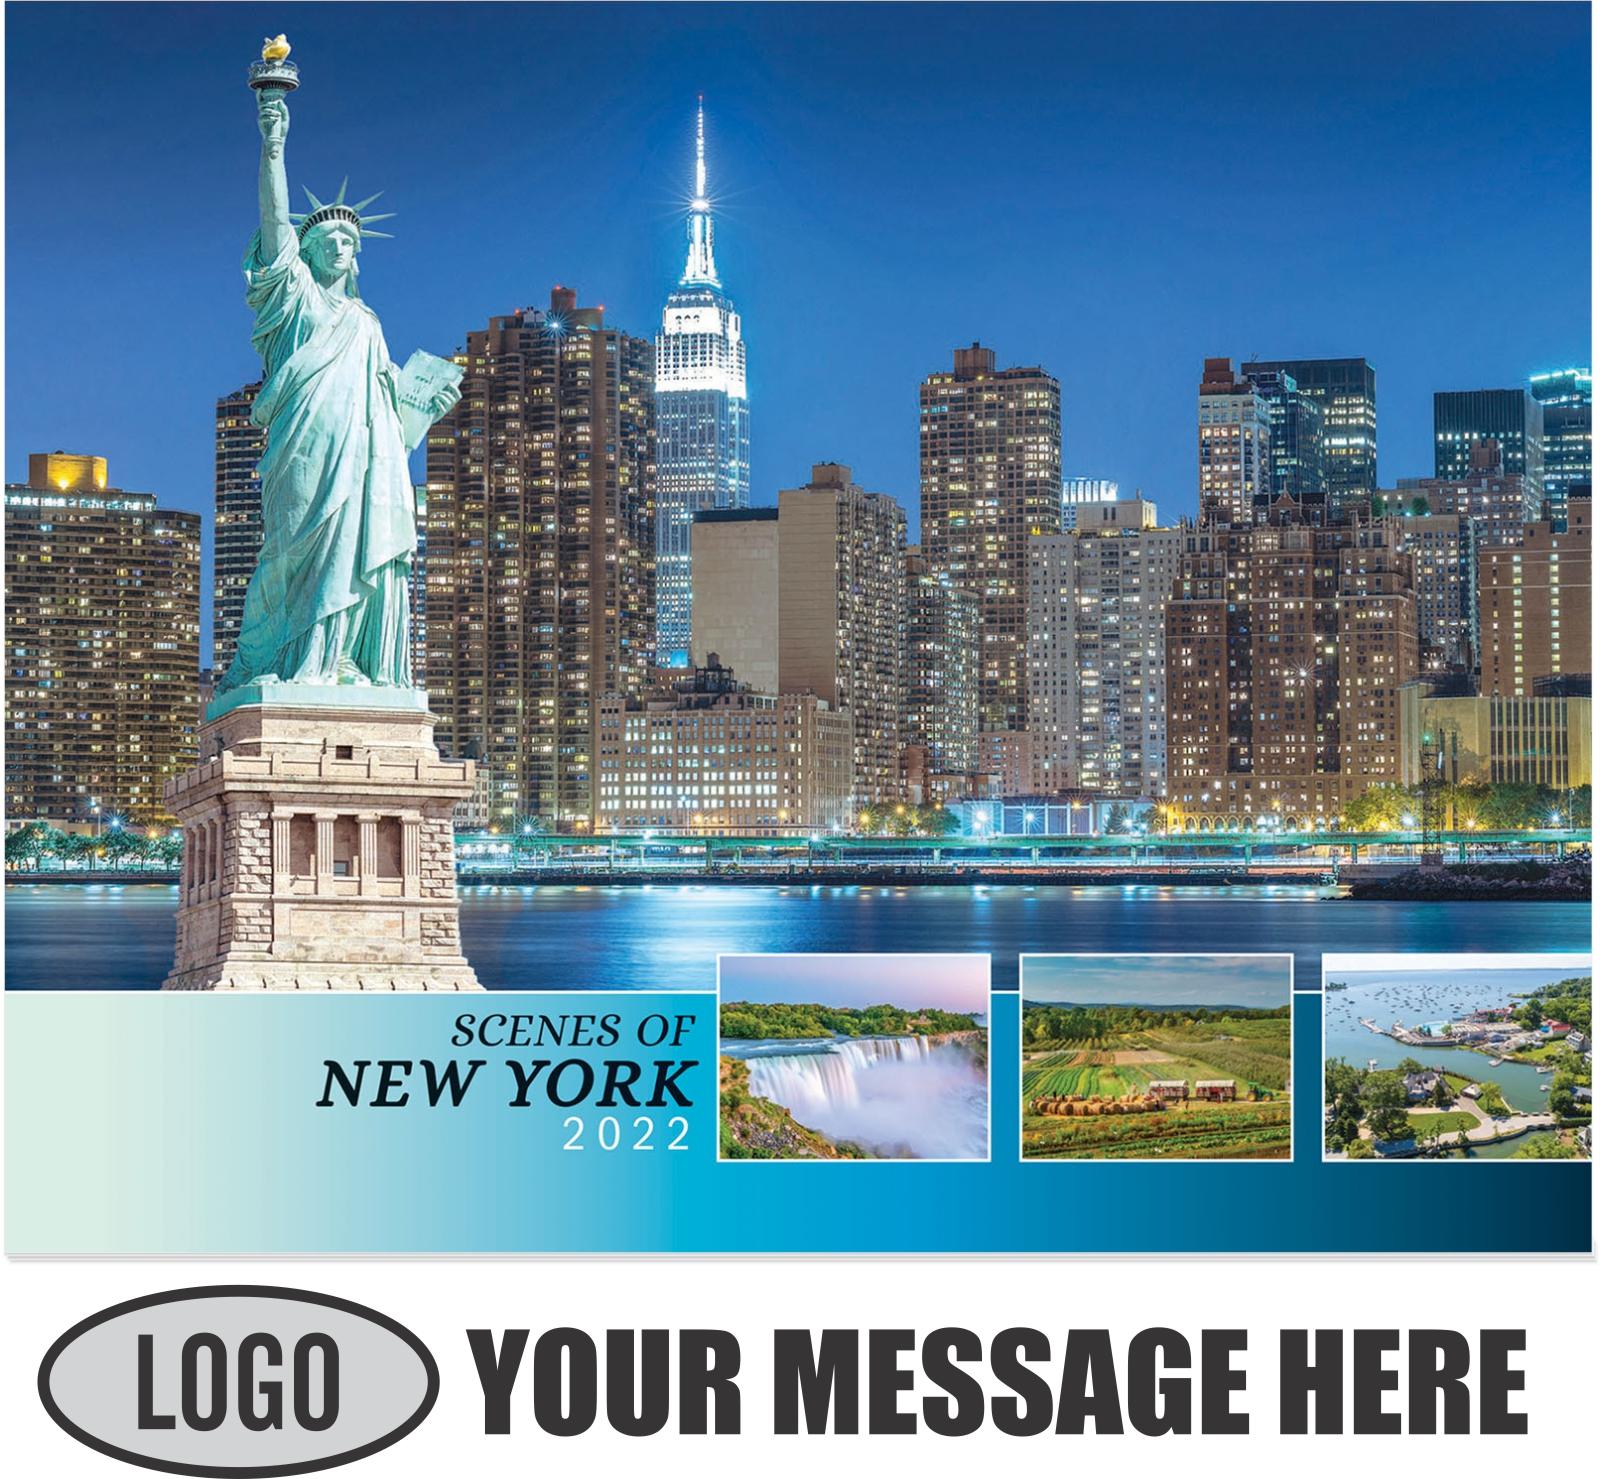 2022 Scenes of New York Promotional Calendar